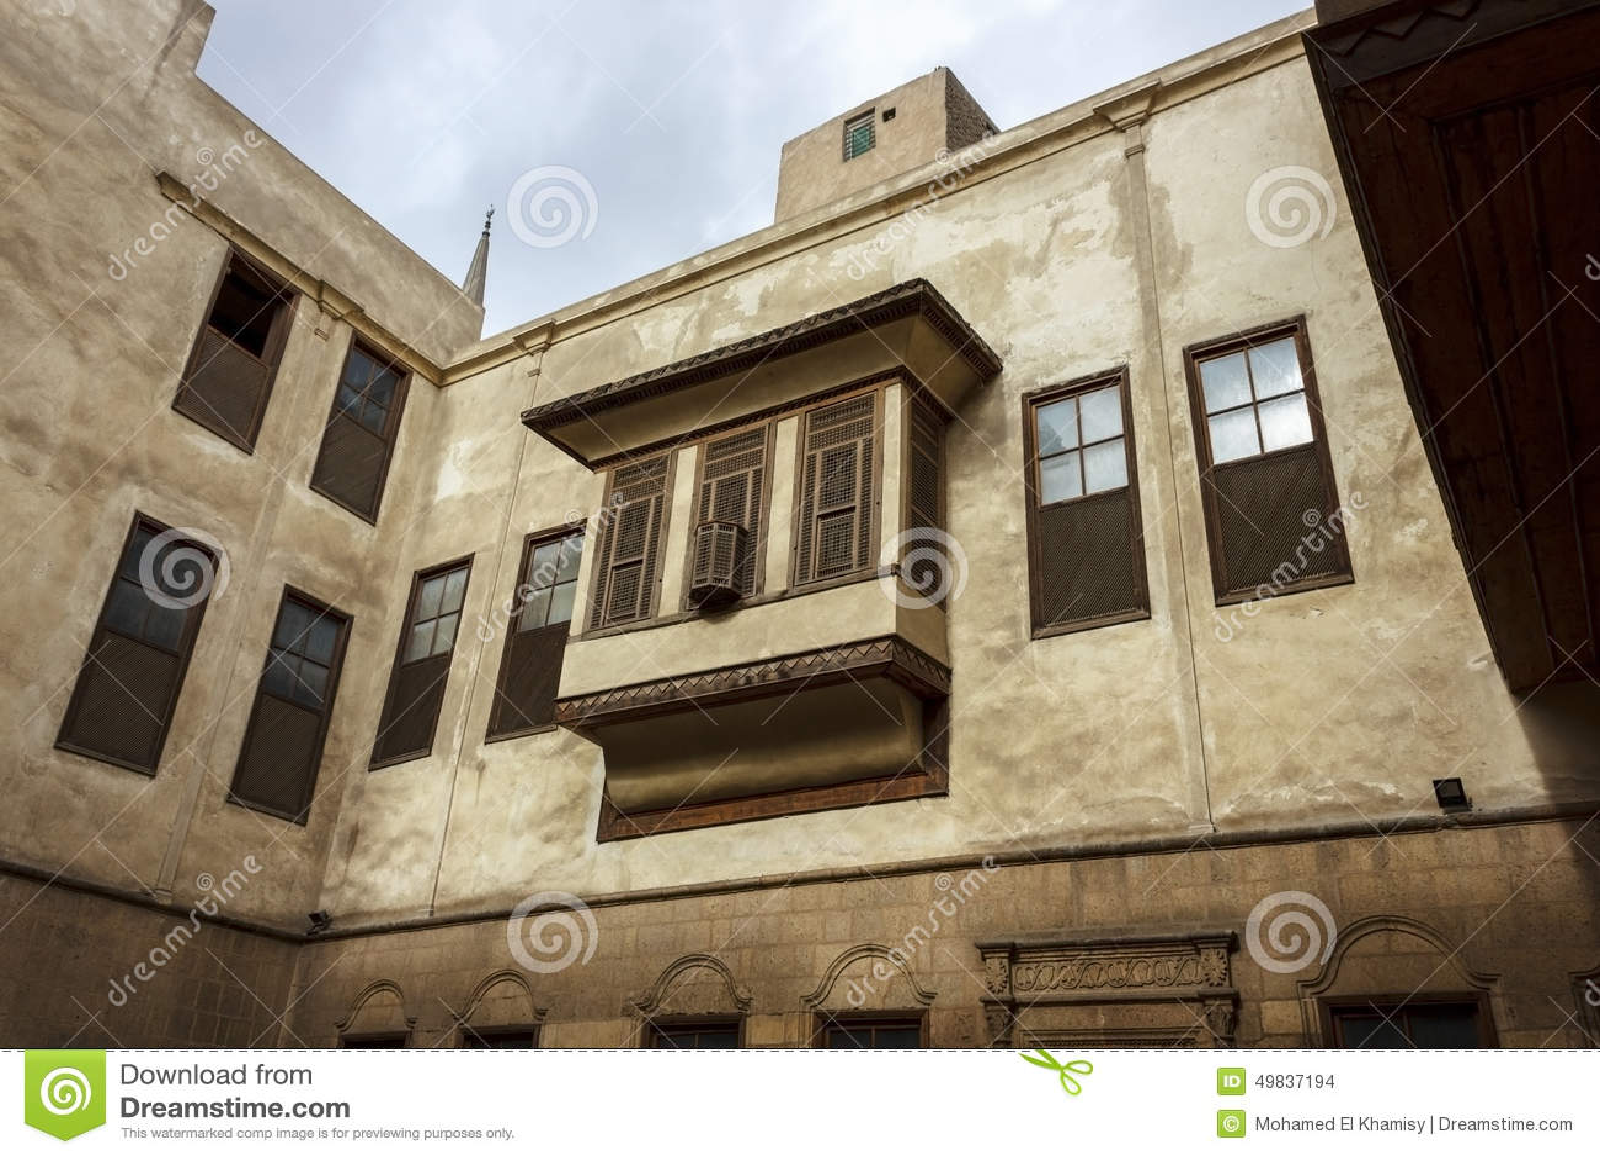 Beit AsSuhaymiTypical House In Islamic Cairo Stock Photo